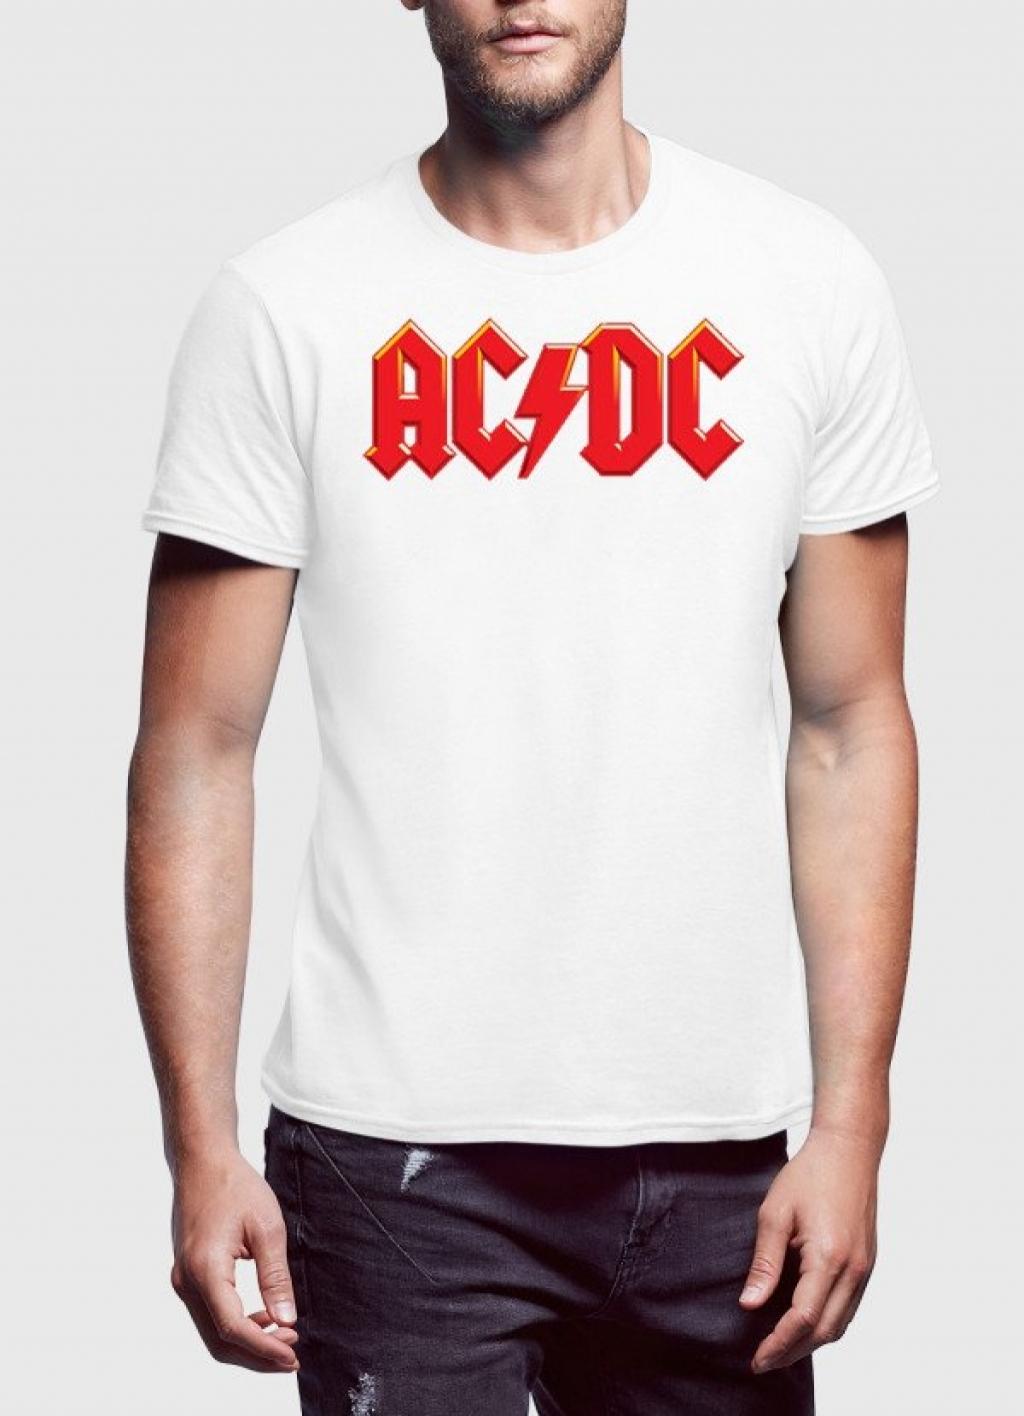 14966540870_ACDC_Back_In_Red_Half_Sleeve_Men_T-Shirt-white.jpg